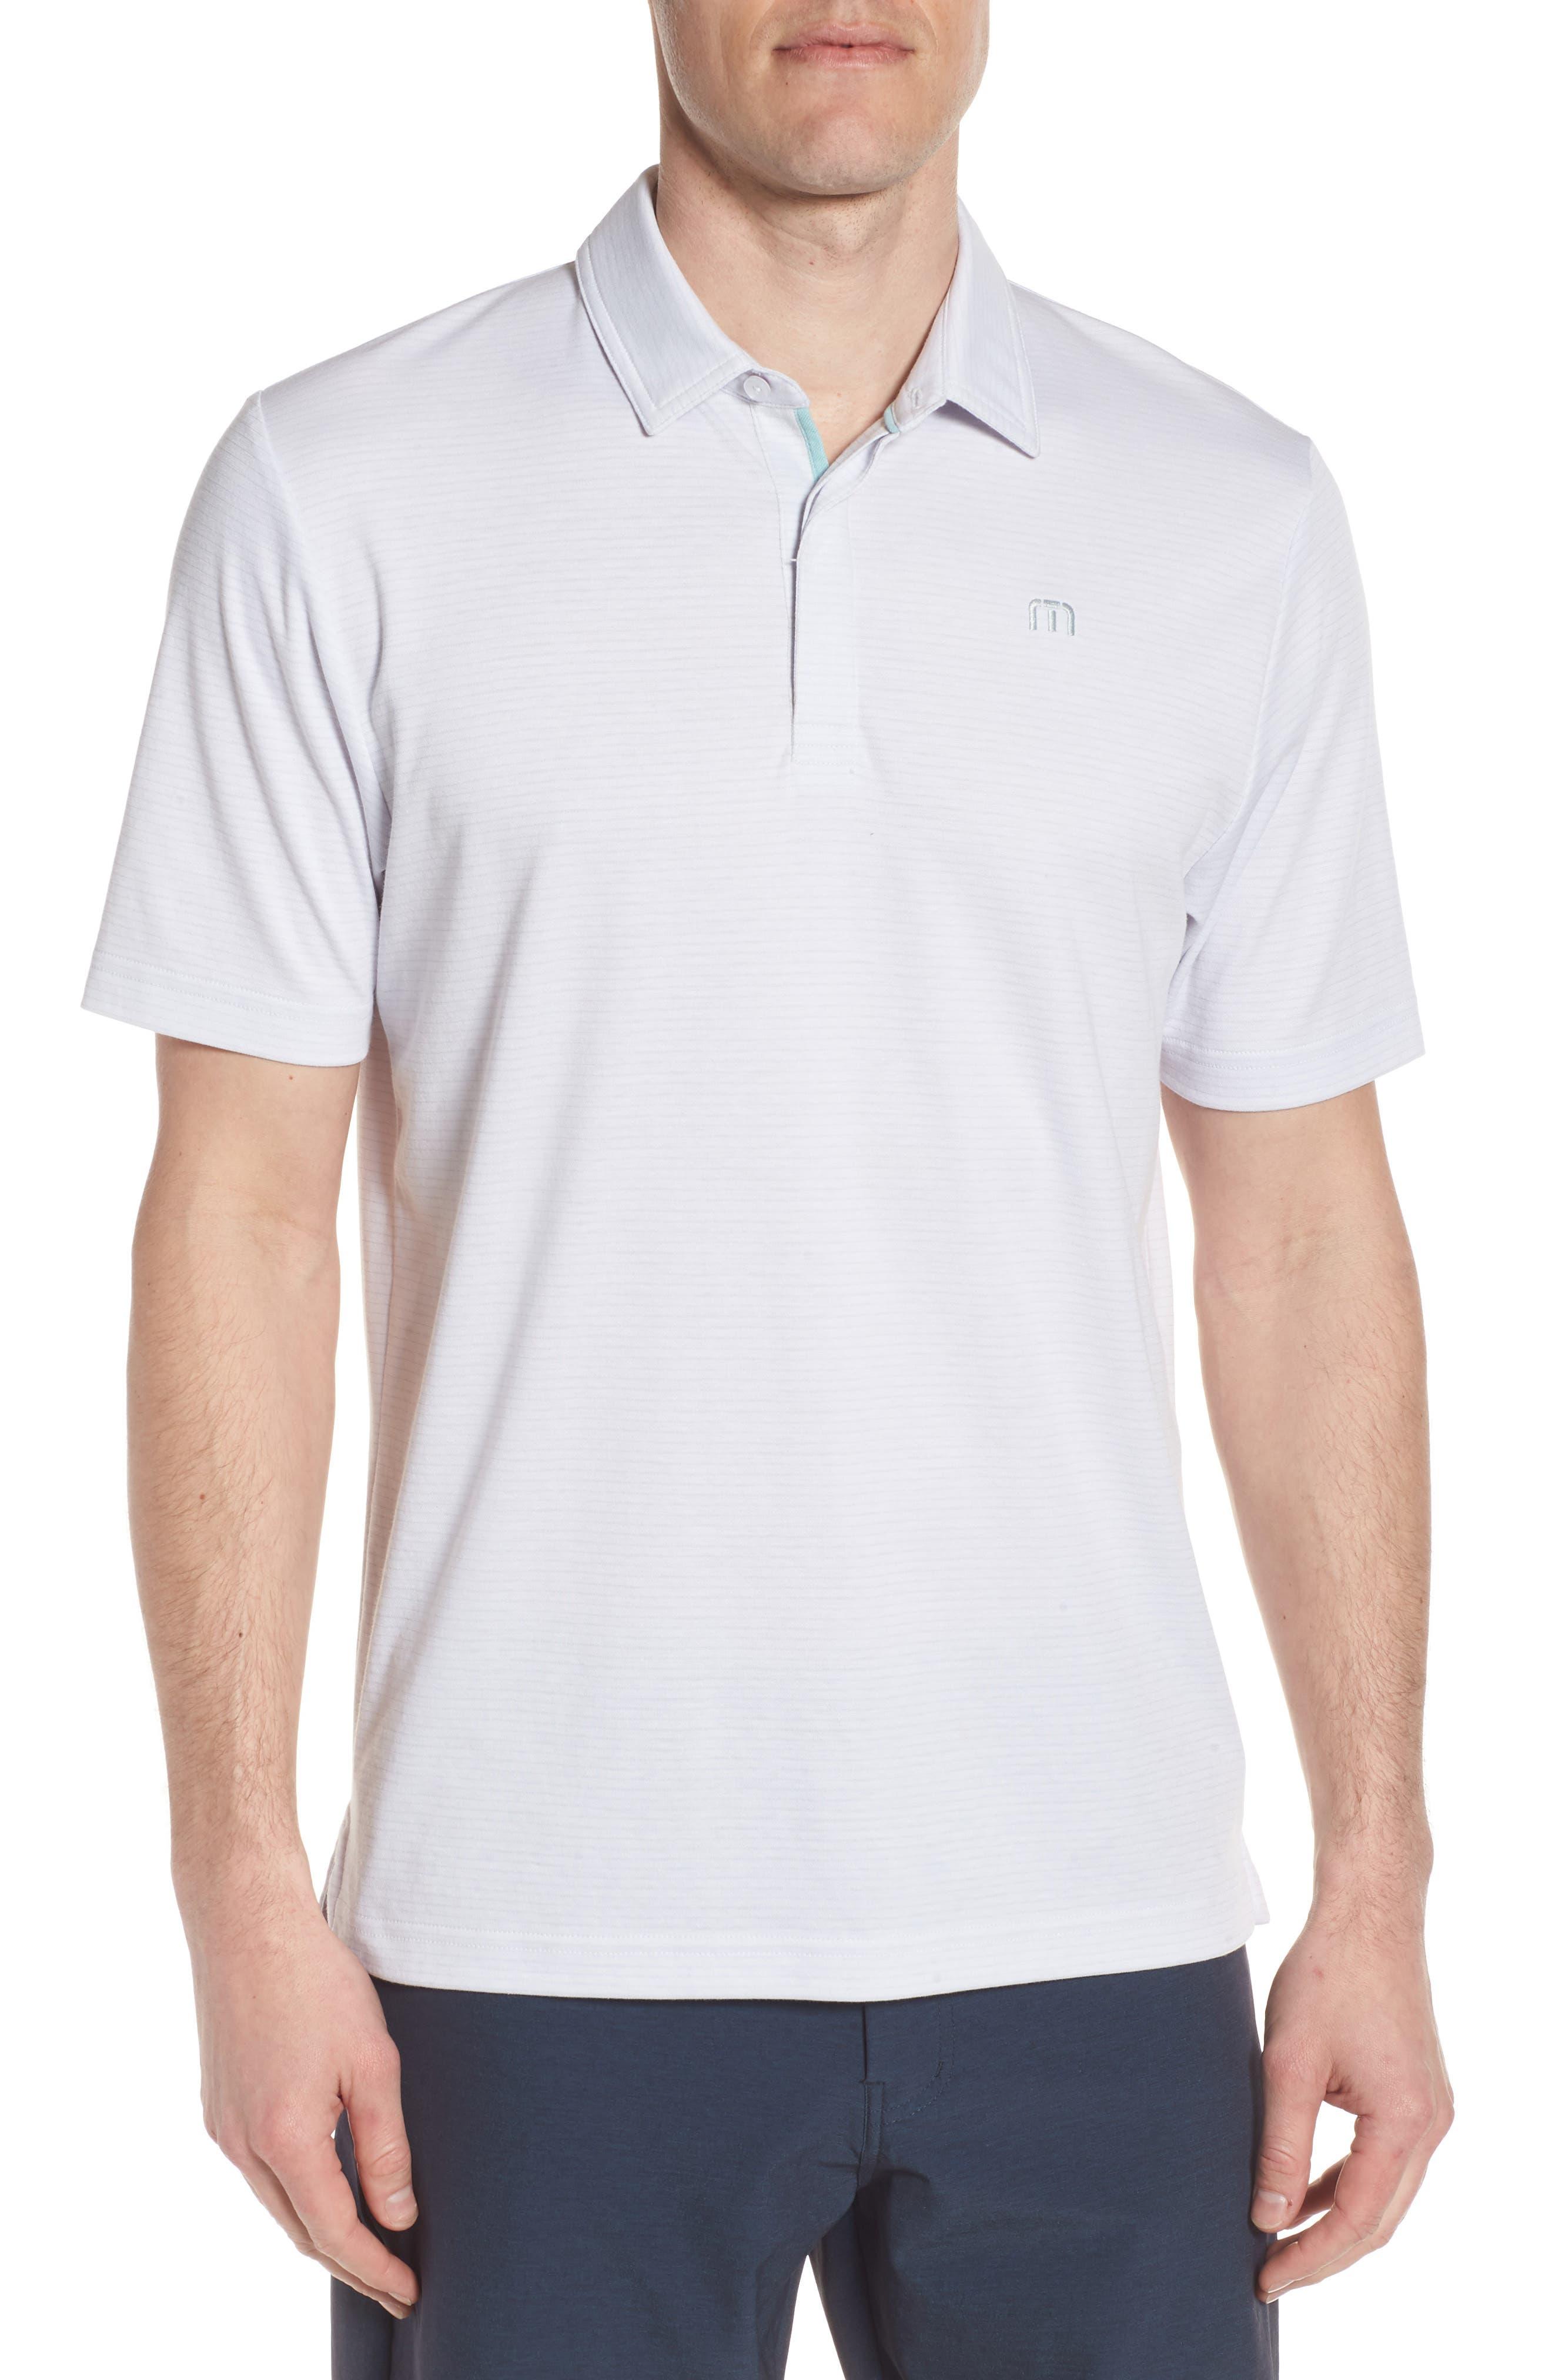 Reece Pinstripe Polo,                         Main,                         color, White/ Micro Chip